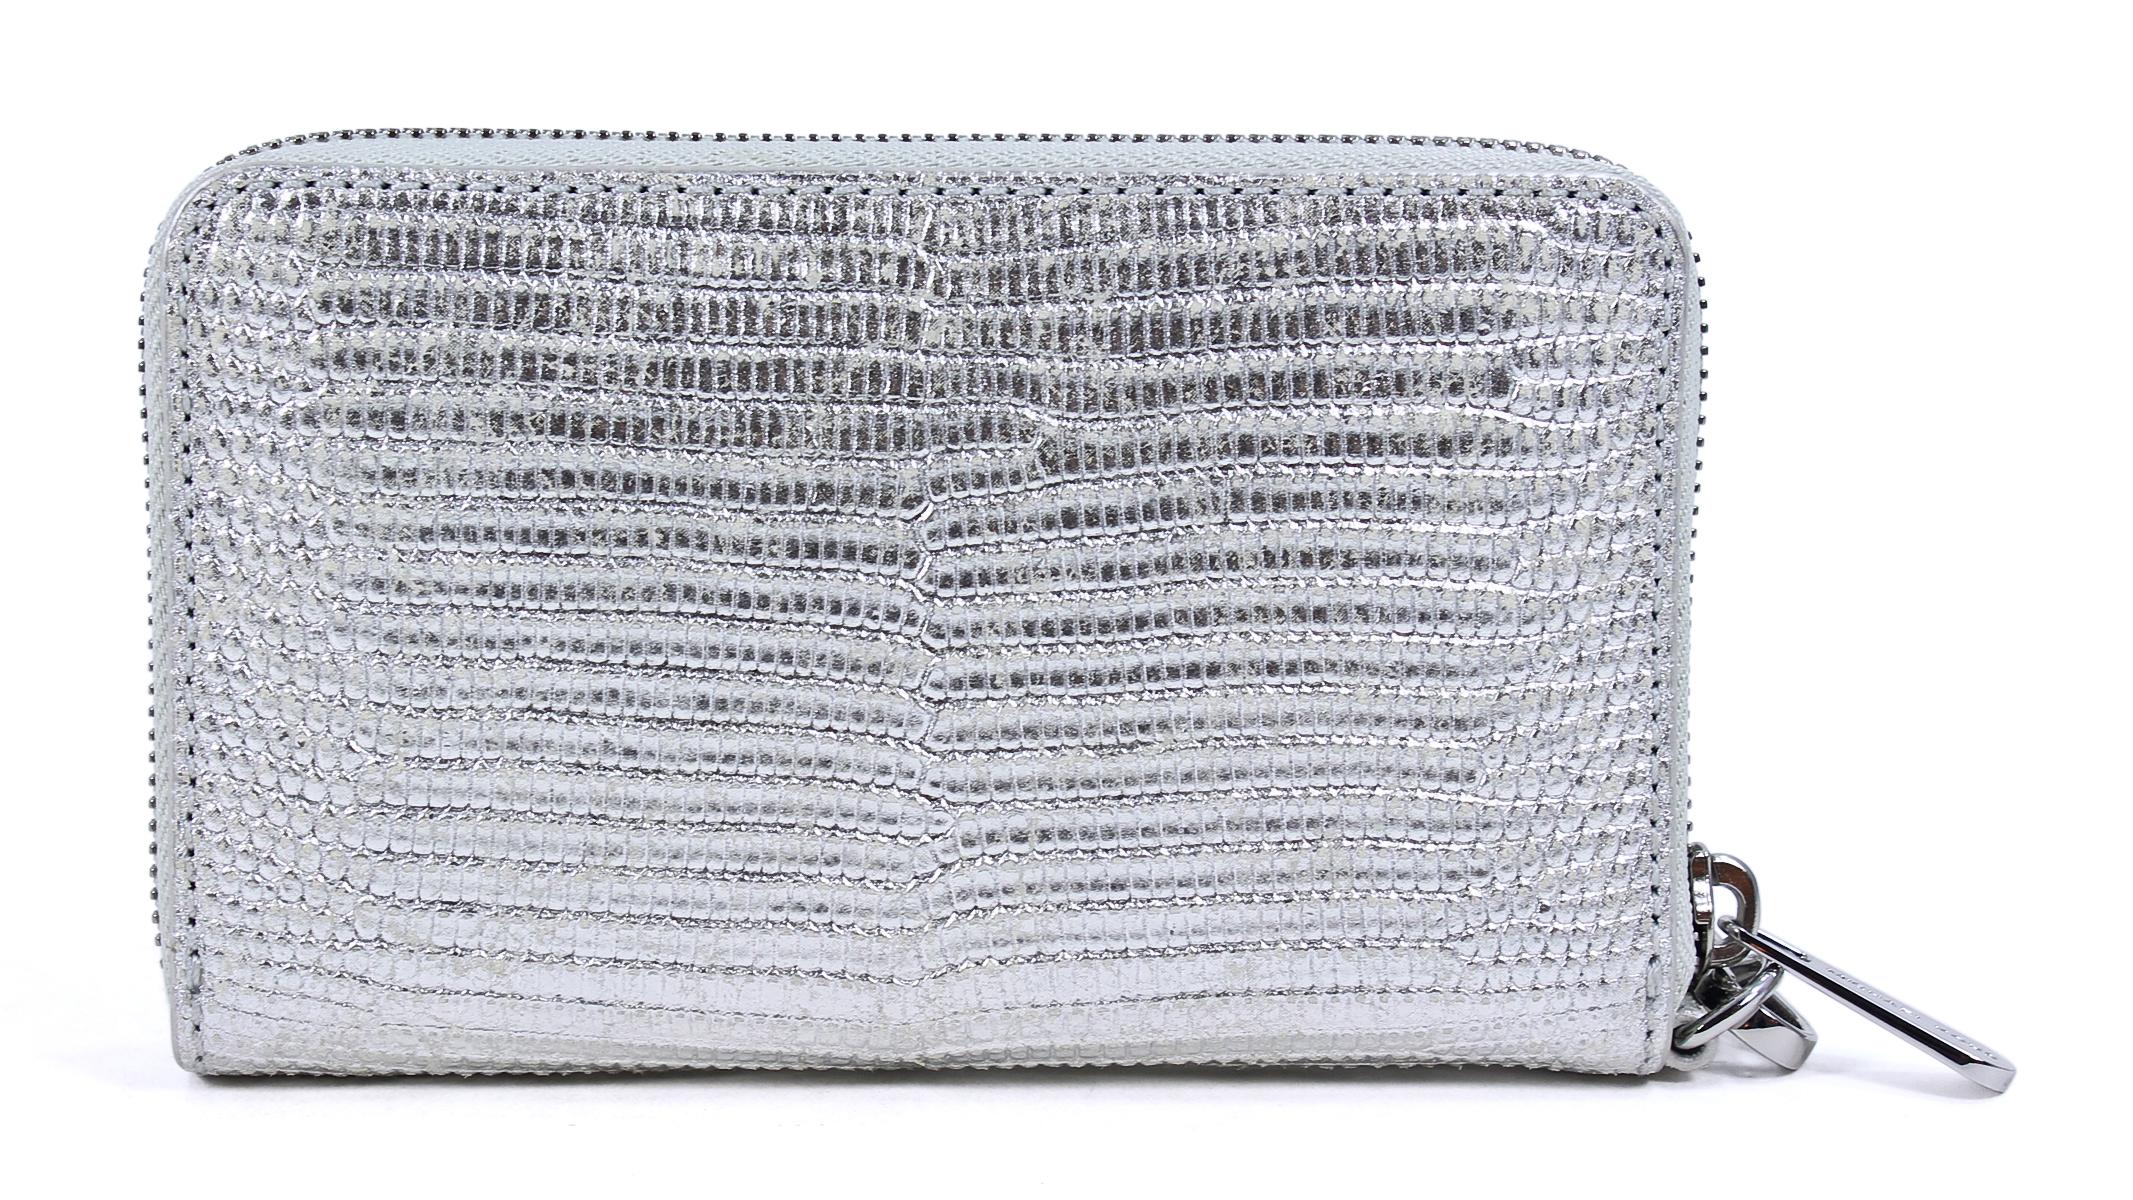 coach handbags outlet store online  designer handbags